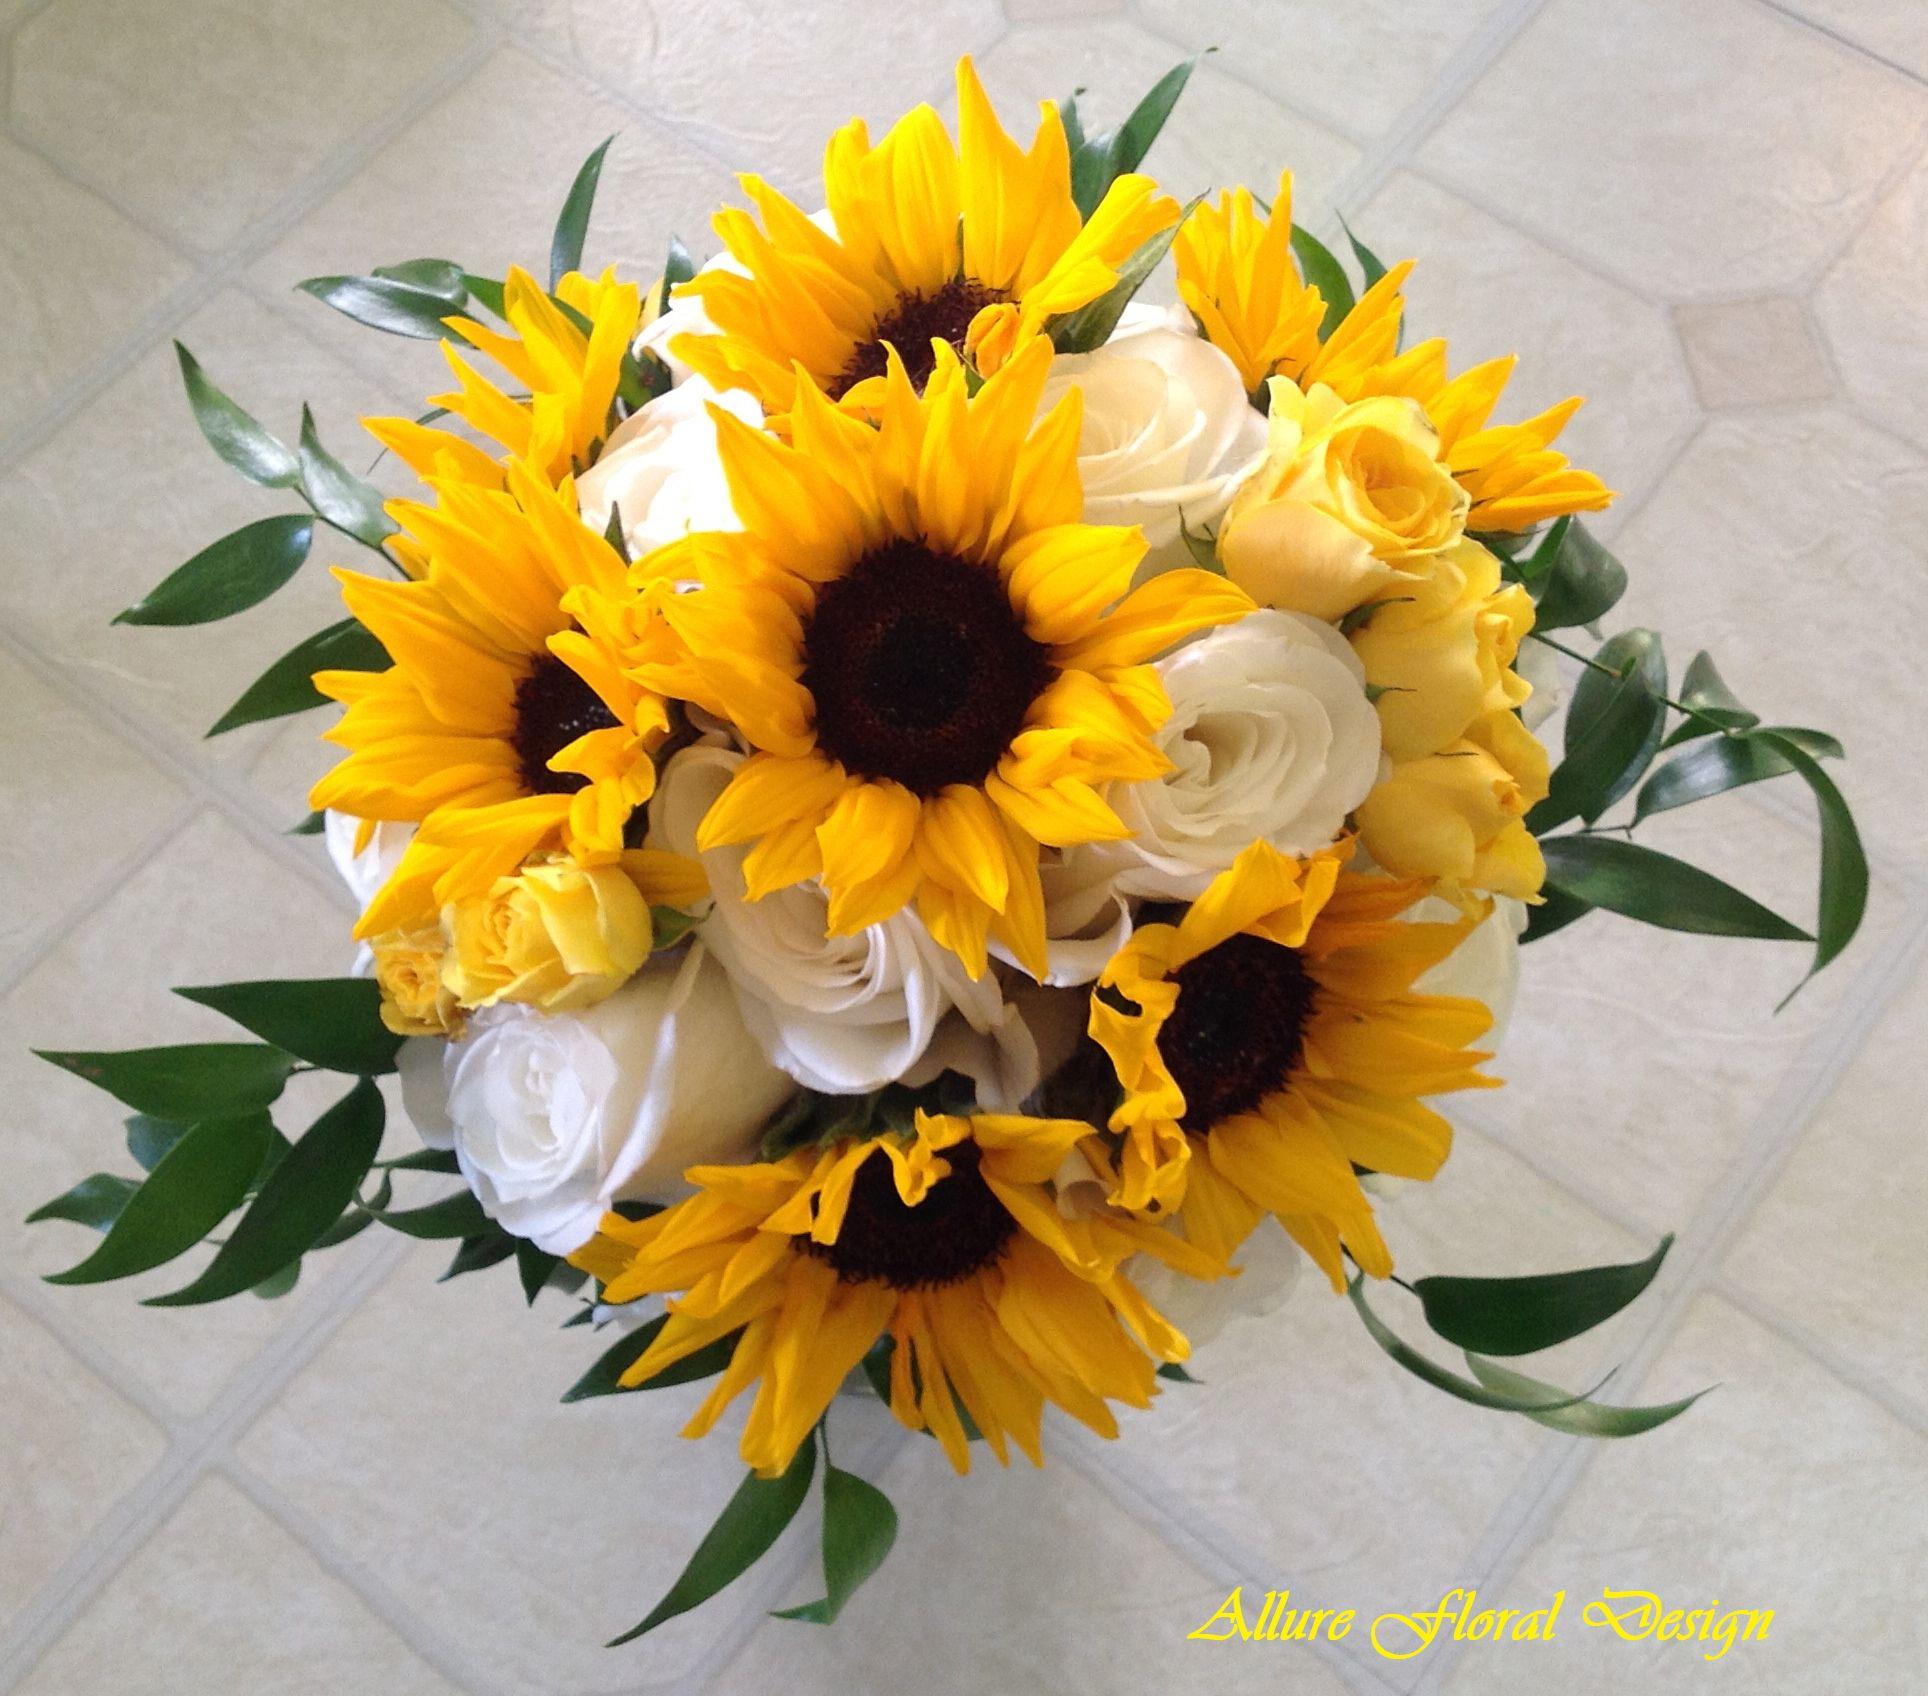 Sunflower Wedding Bouquet Ideas: Sunflower Bridal Bouquet